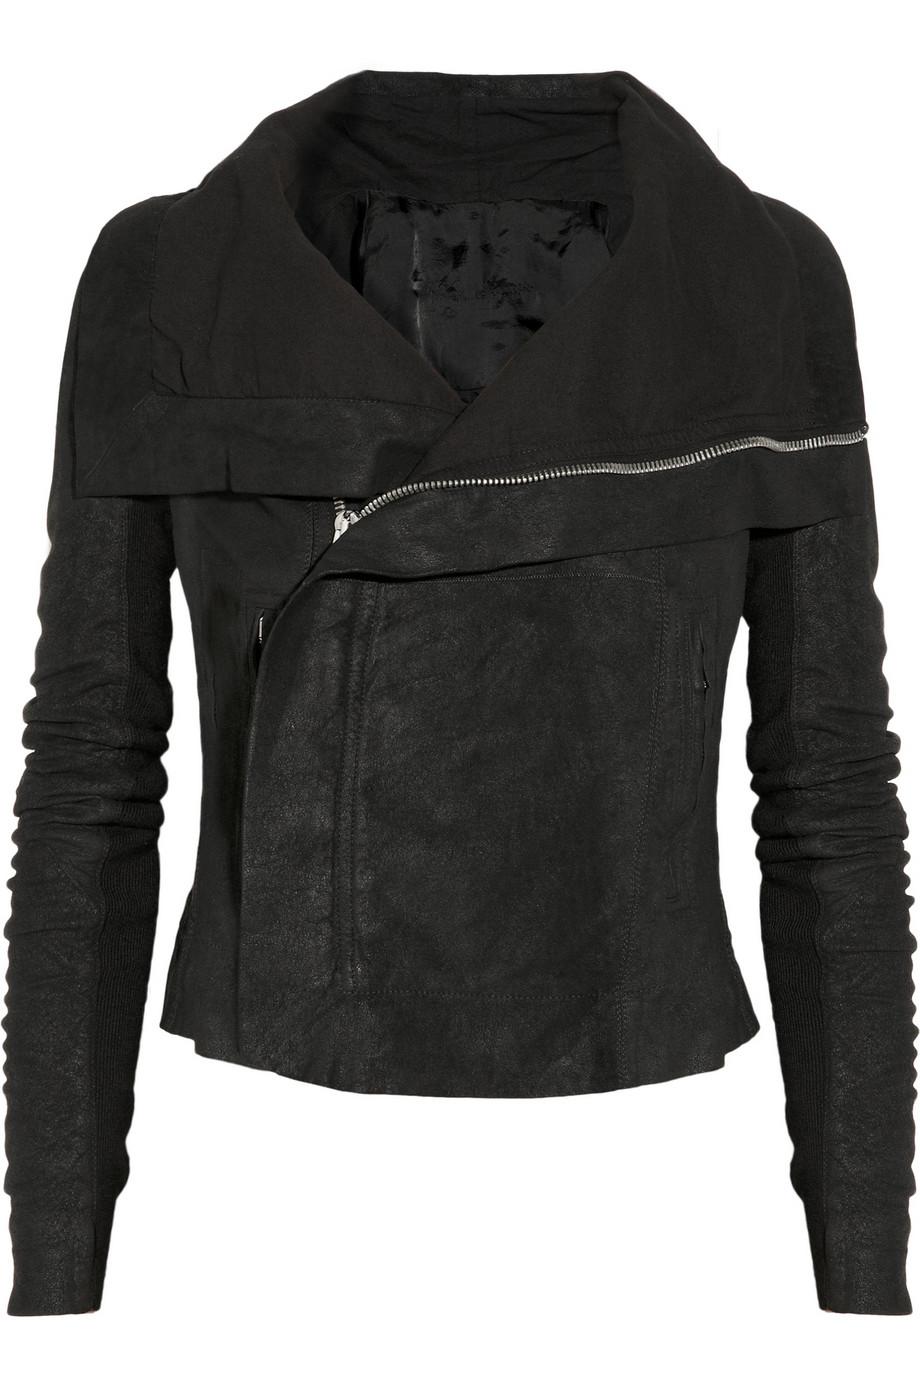 Rick Owens biker jacket - $2,620 at  Net-a-porter